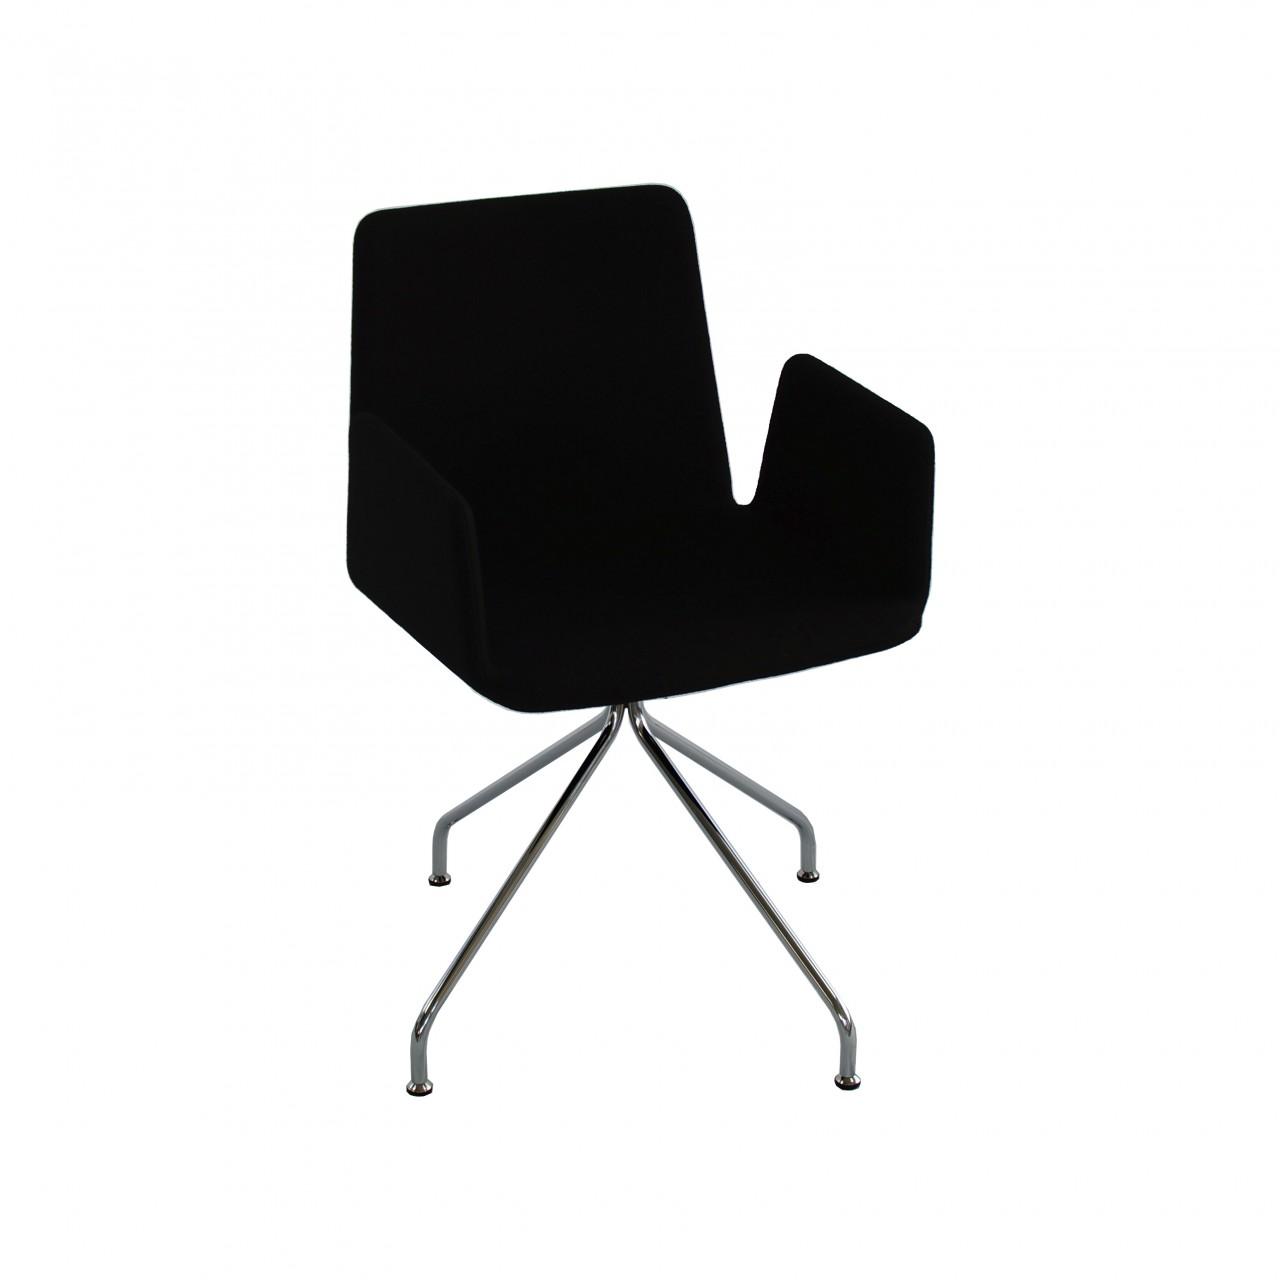 WING swivel chair/ Bezug Europost